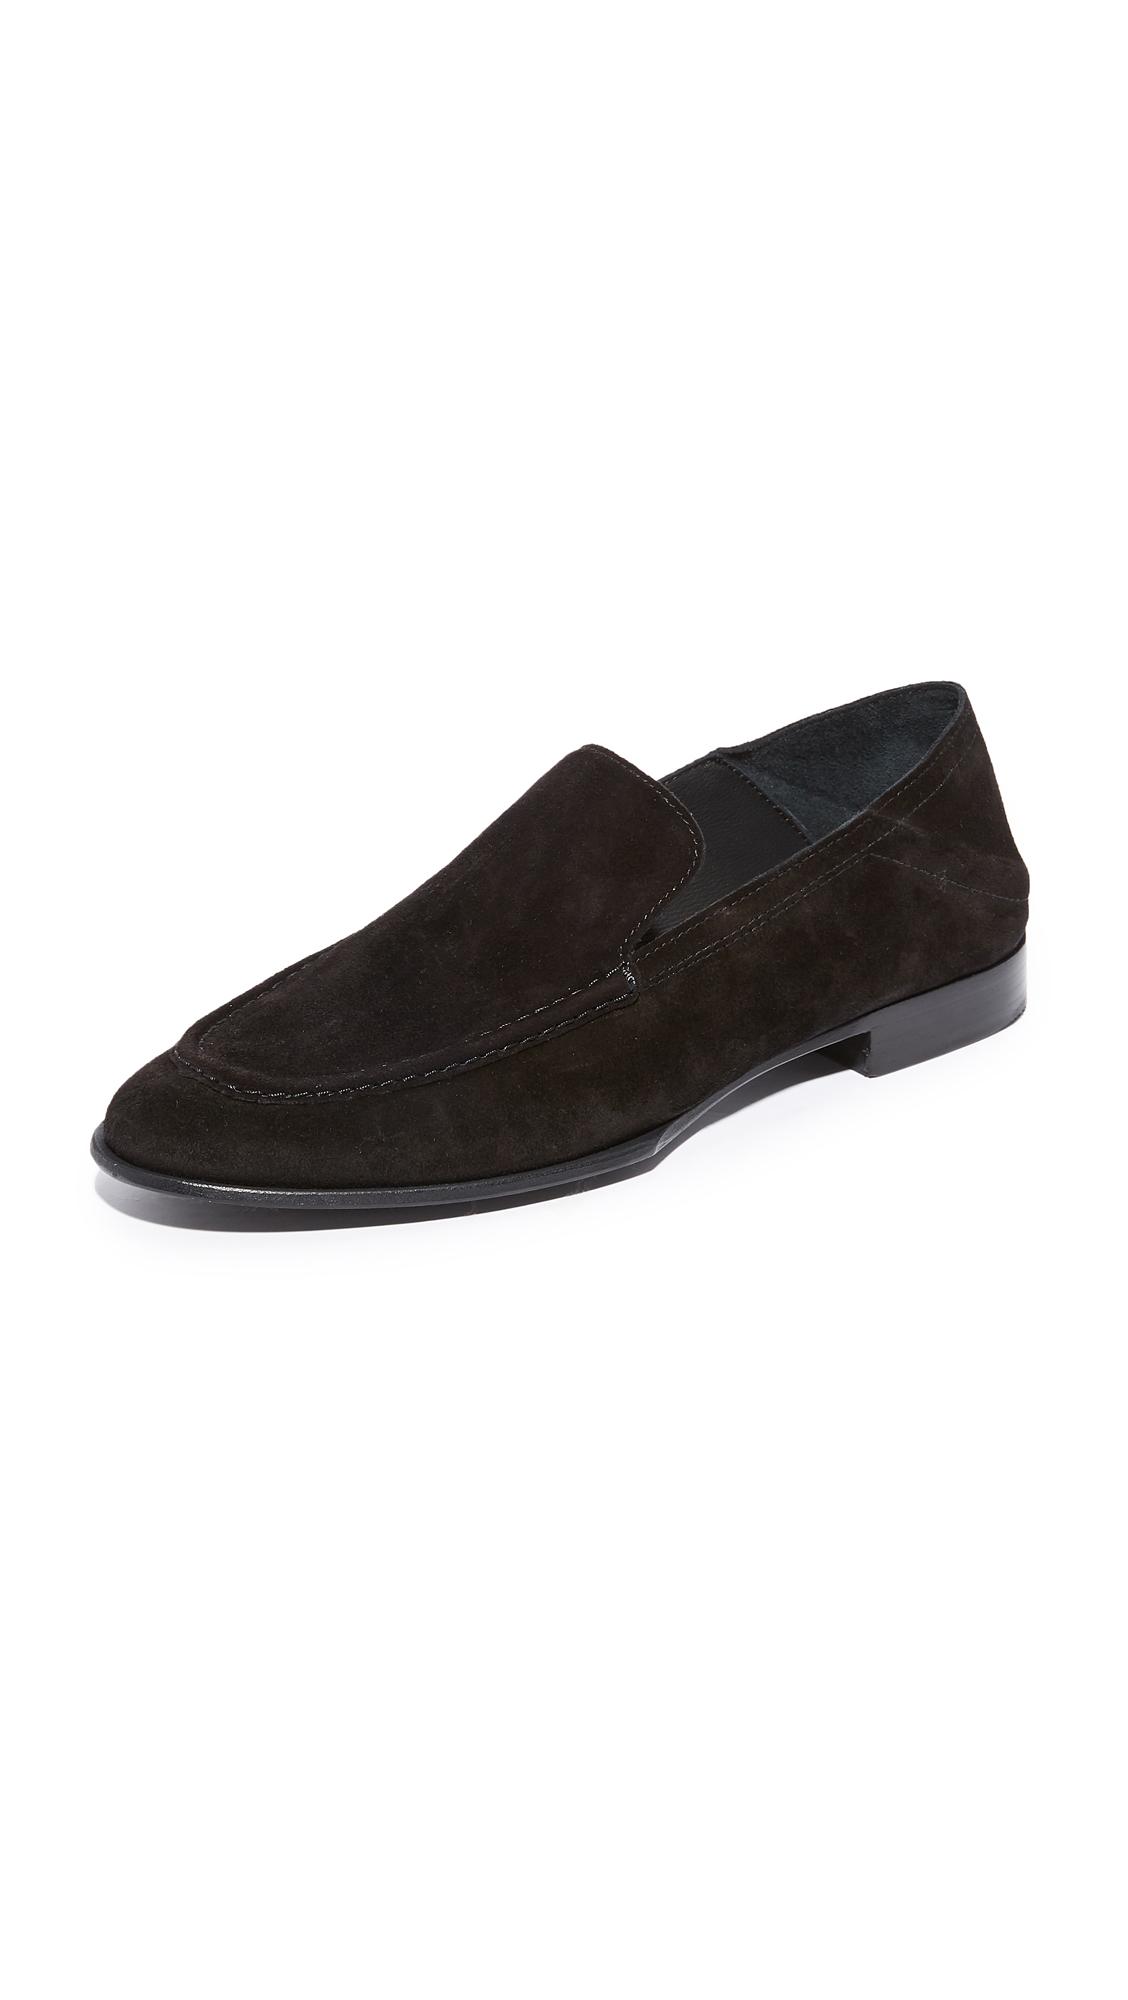 Rag & Bone Alix Convertible Loafers - Black